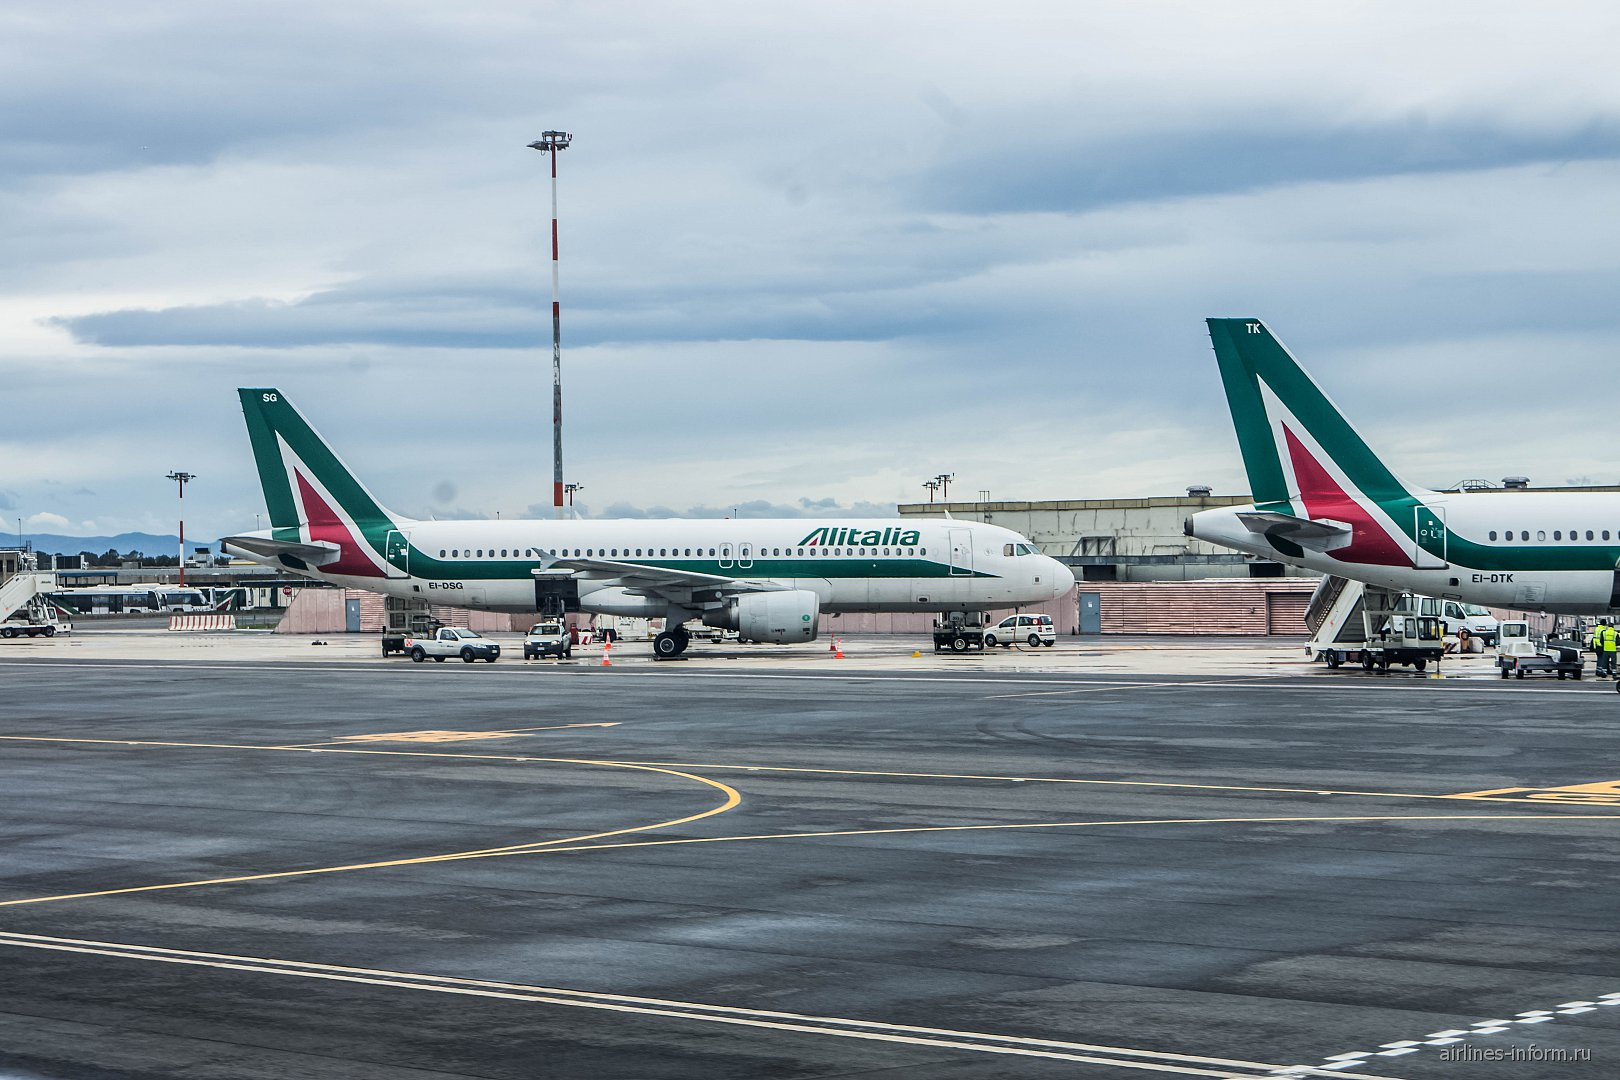 Airbus A320 авиакомпании Alitalia в аэропорту Рим Фьюмичино